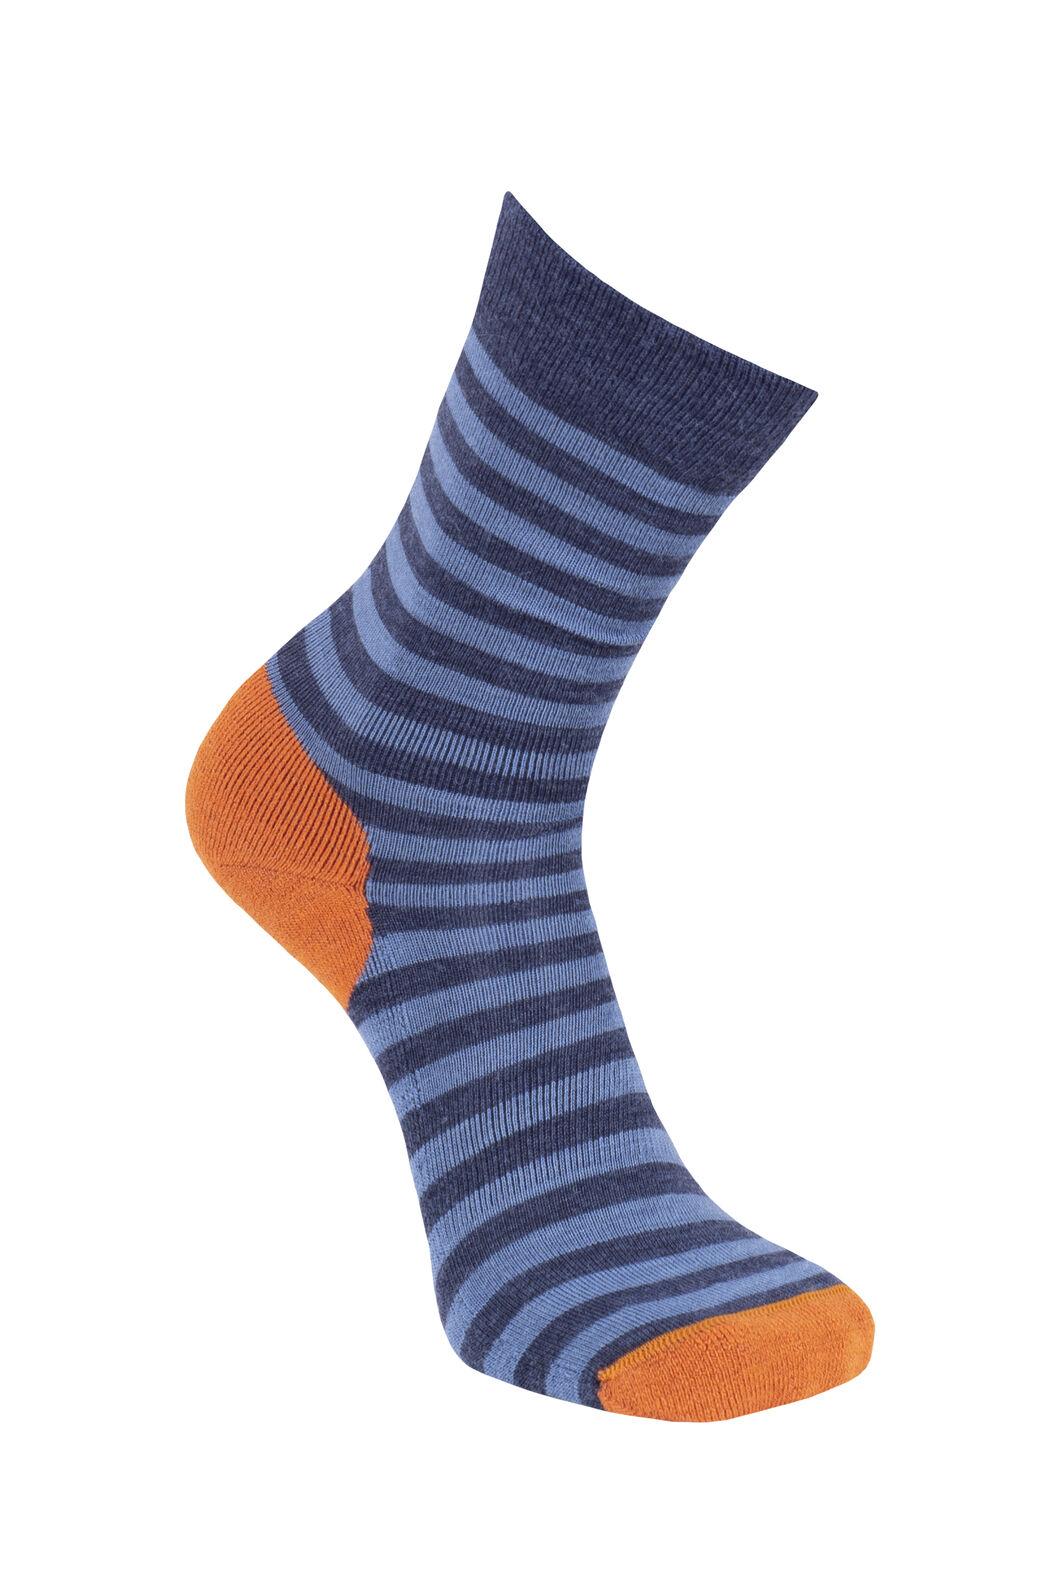 Macpac Merino Blend Footprint Socks, Black Iris/Orange, hi-res